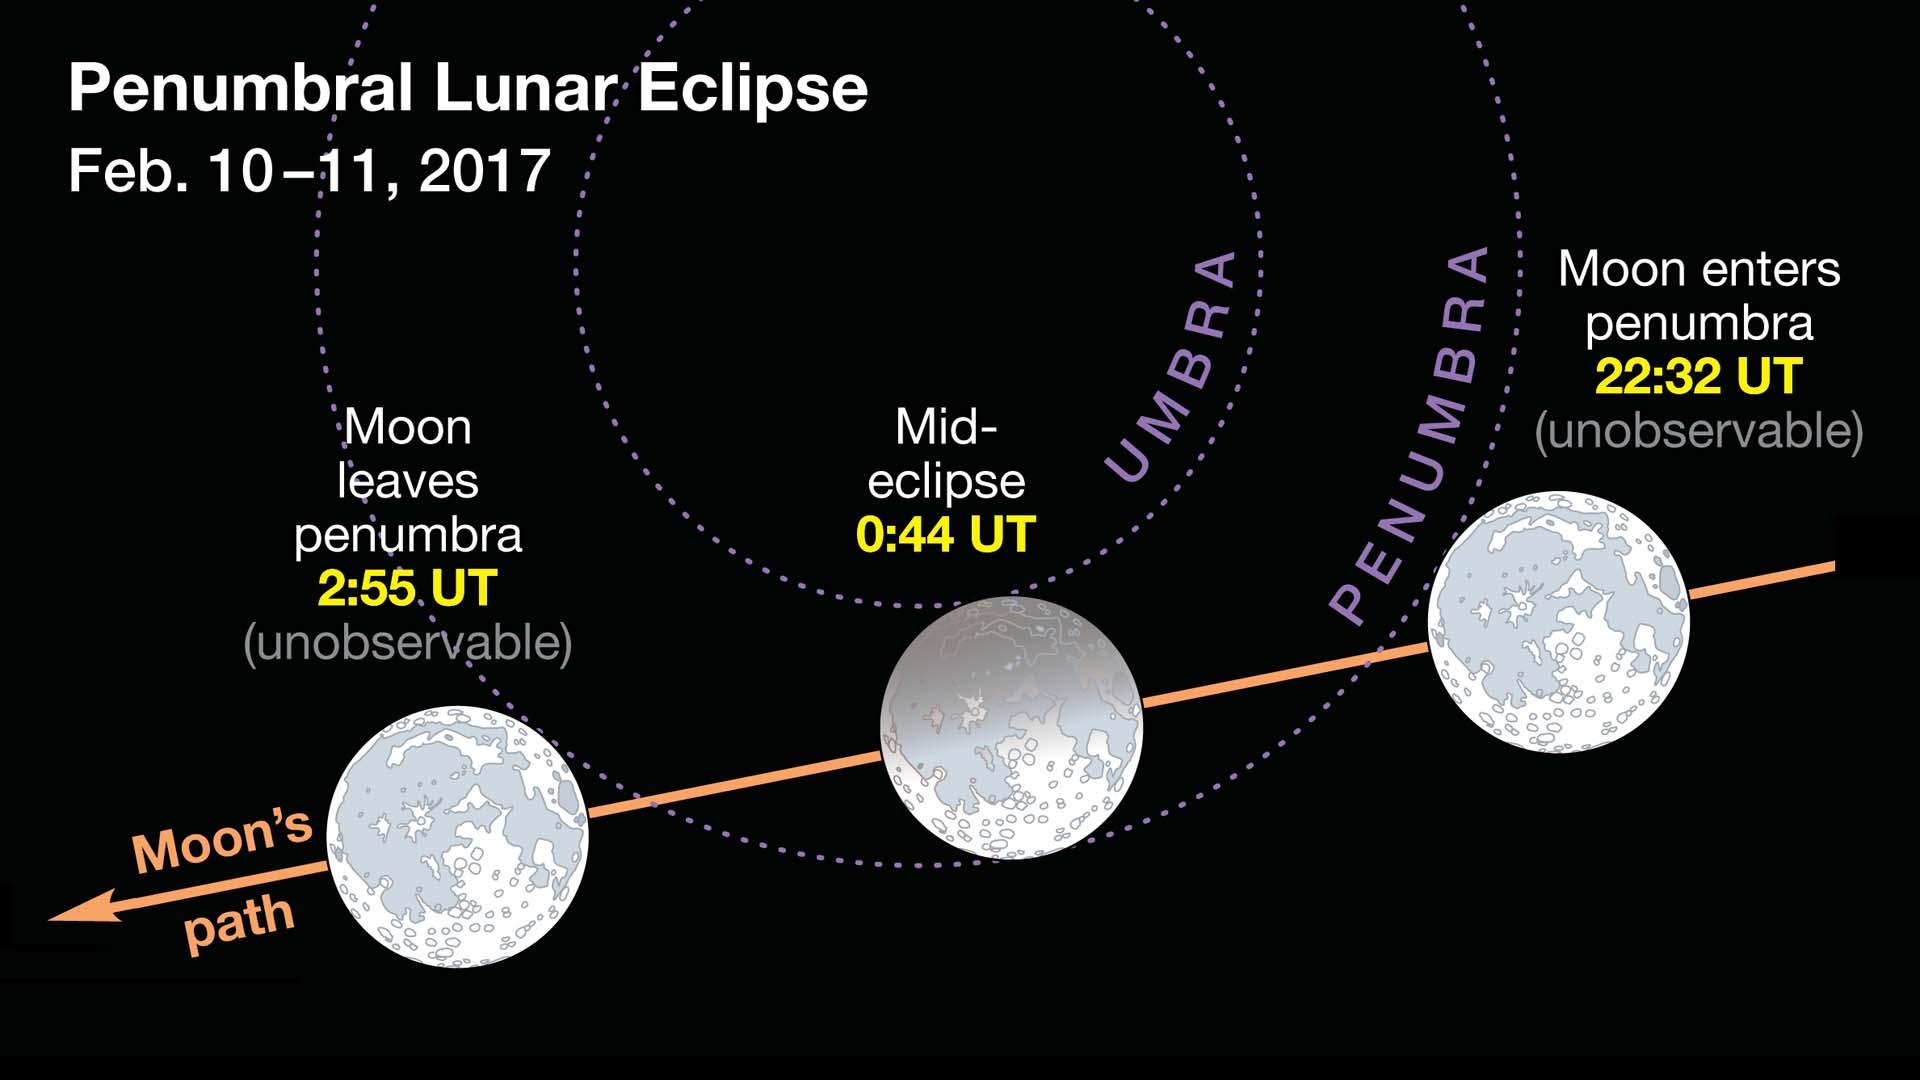 February lunar eclipses in 2017